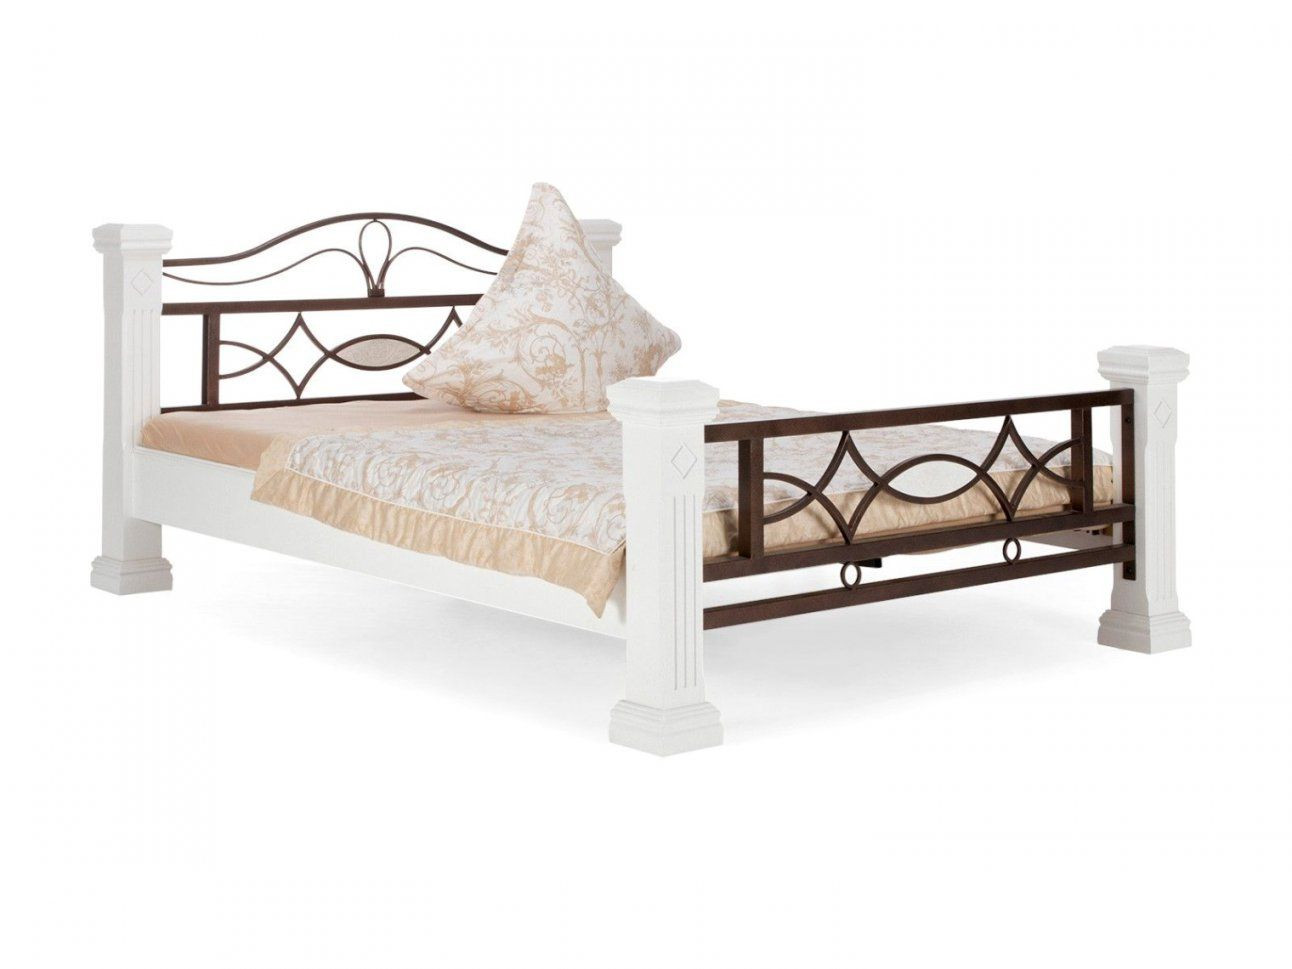 Full Size of Kinderbett Poco Bett 90200 Metall Wunderbar Bettgestell Weiss Me Küche Big Sofa 140x200 Betten Schlafzimmer Komplett Wohnzimmer Kinderbett Poco